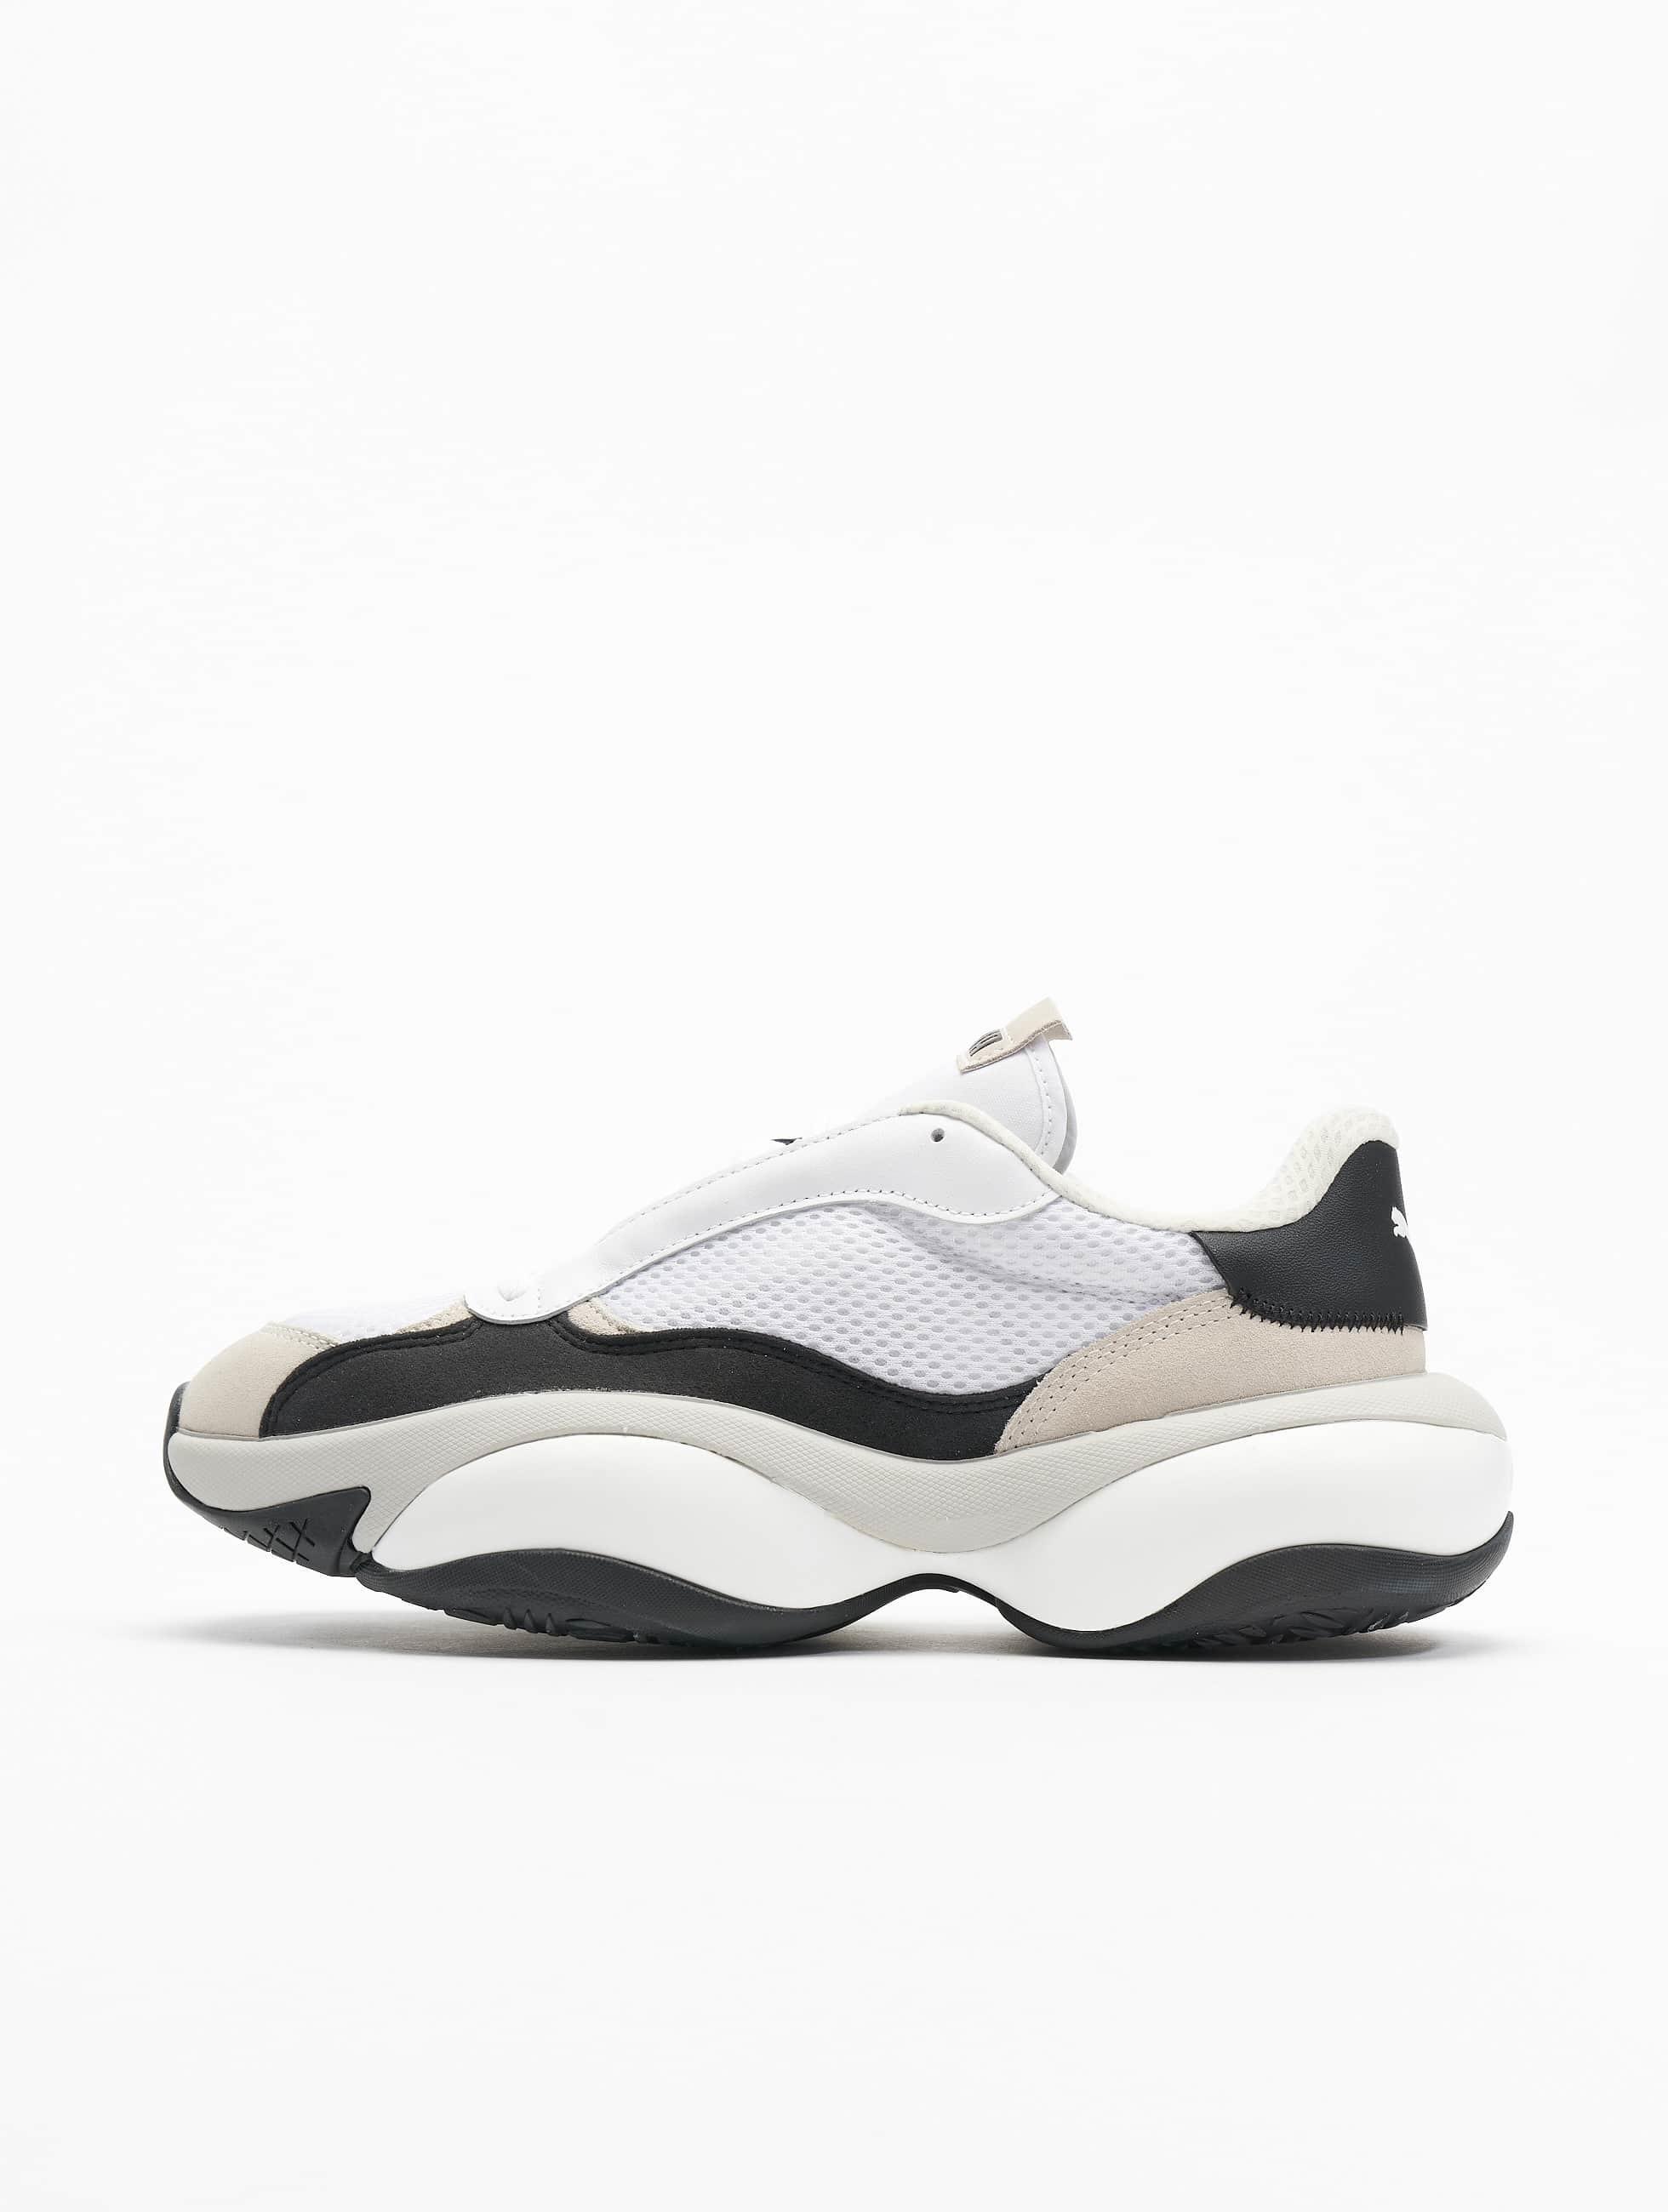 Puma Alteration Kurve No Mesh Sneakers Vaporous GrayPuma White